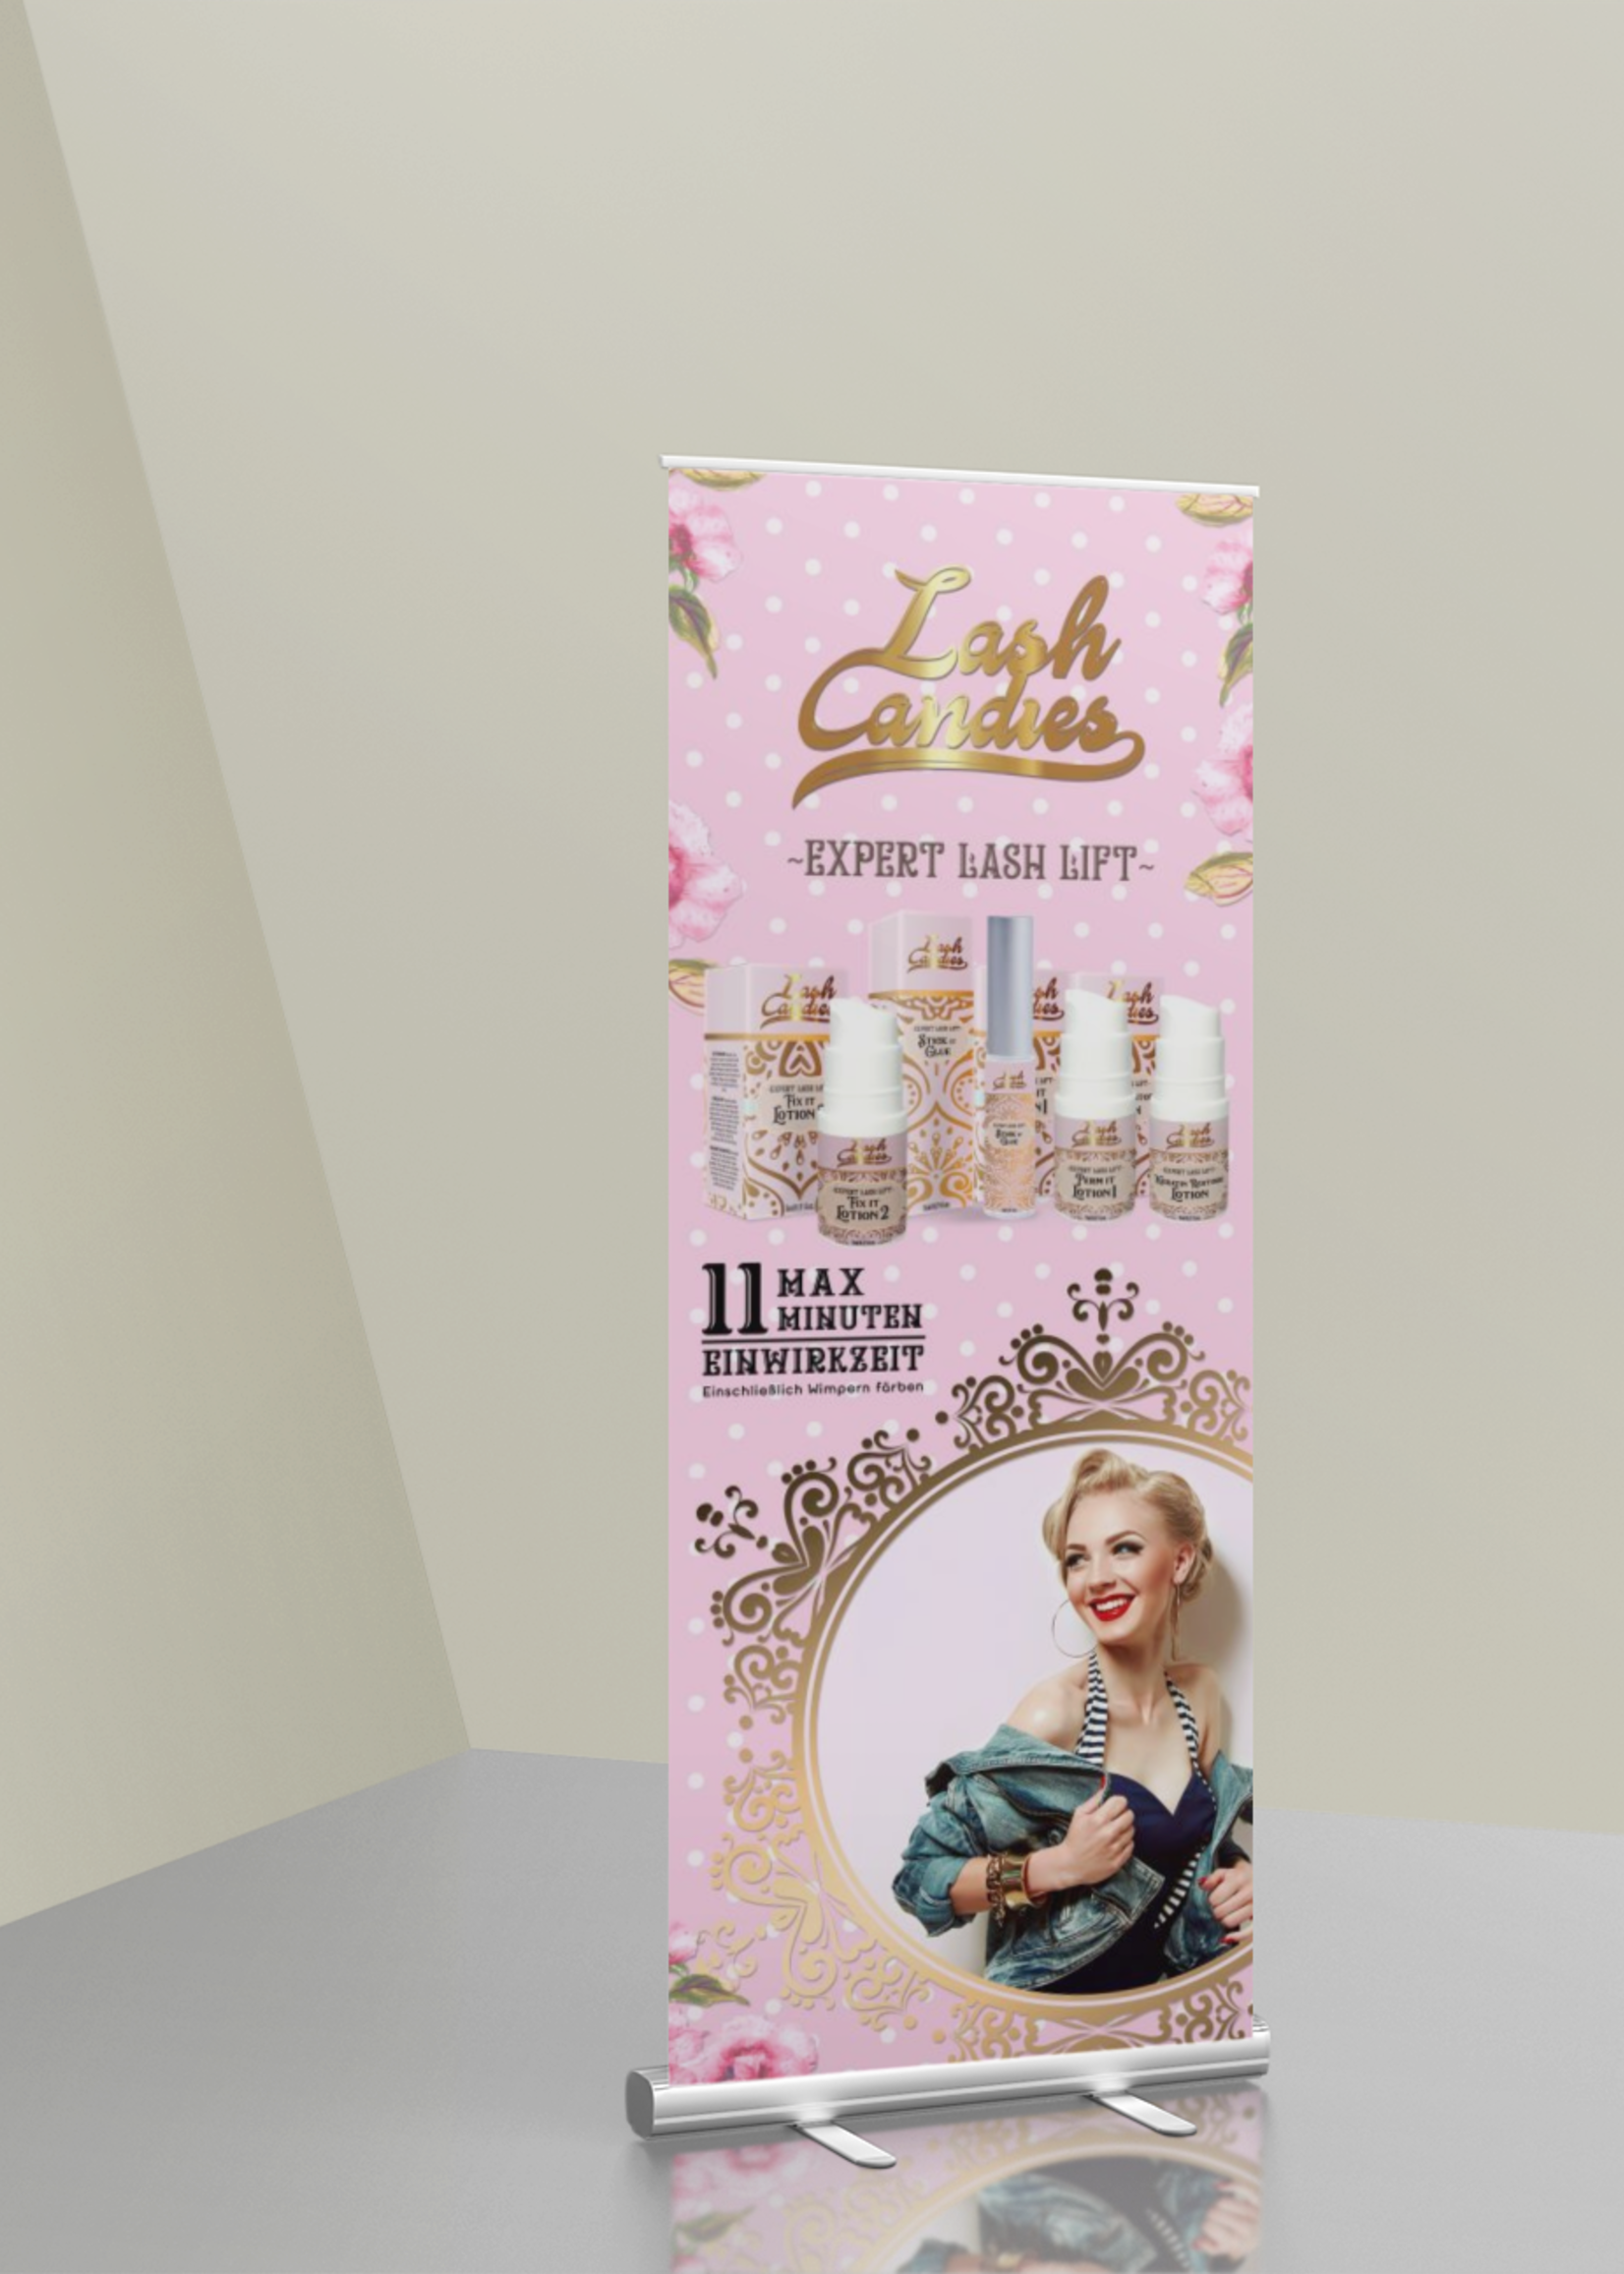 Lash Candies® Roll up Banner 85 x 200 cm Schulung